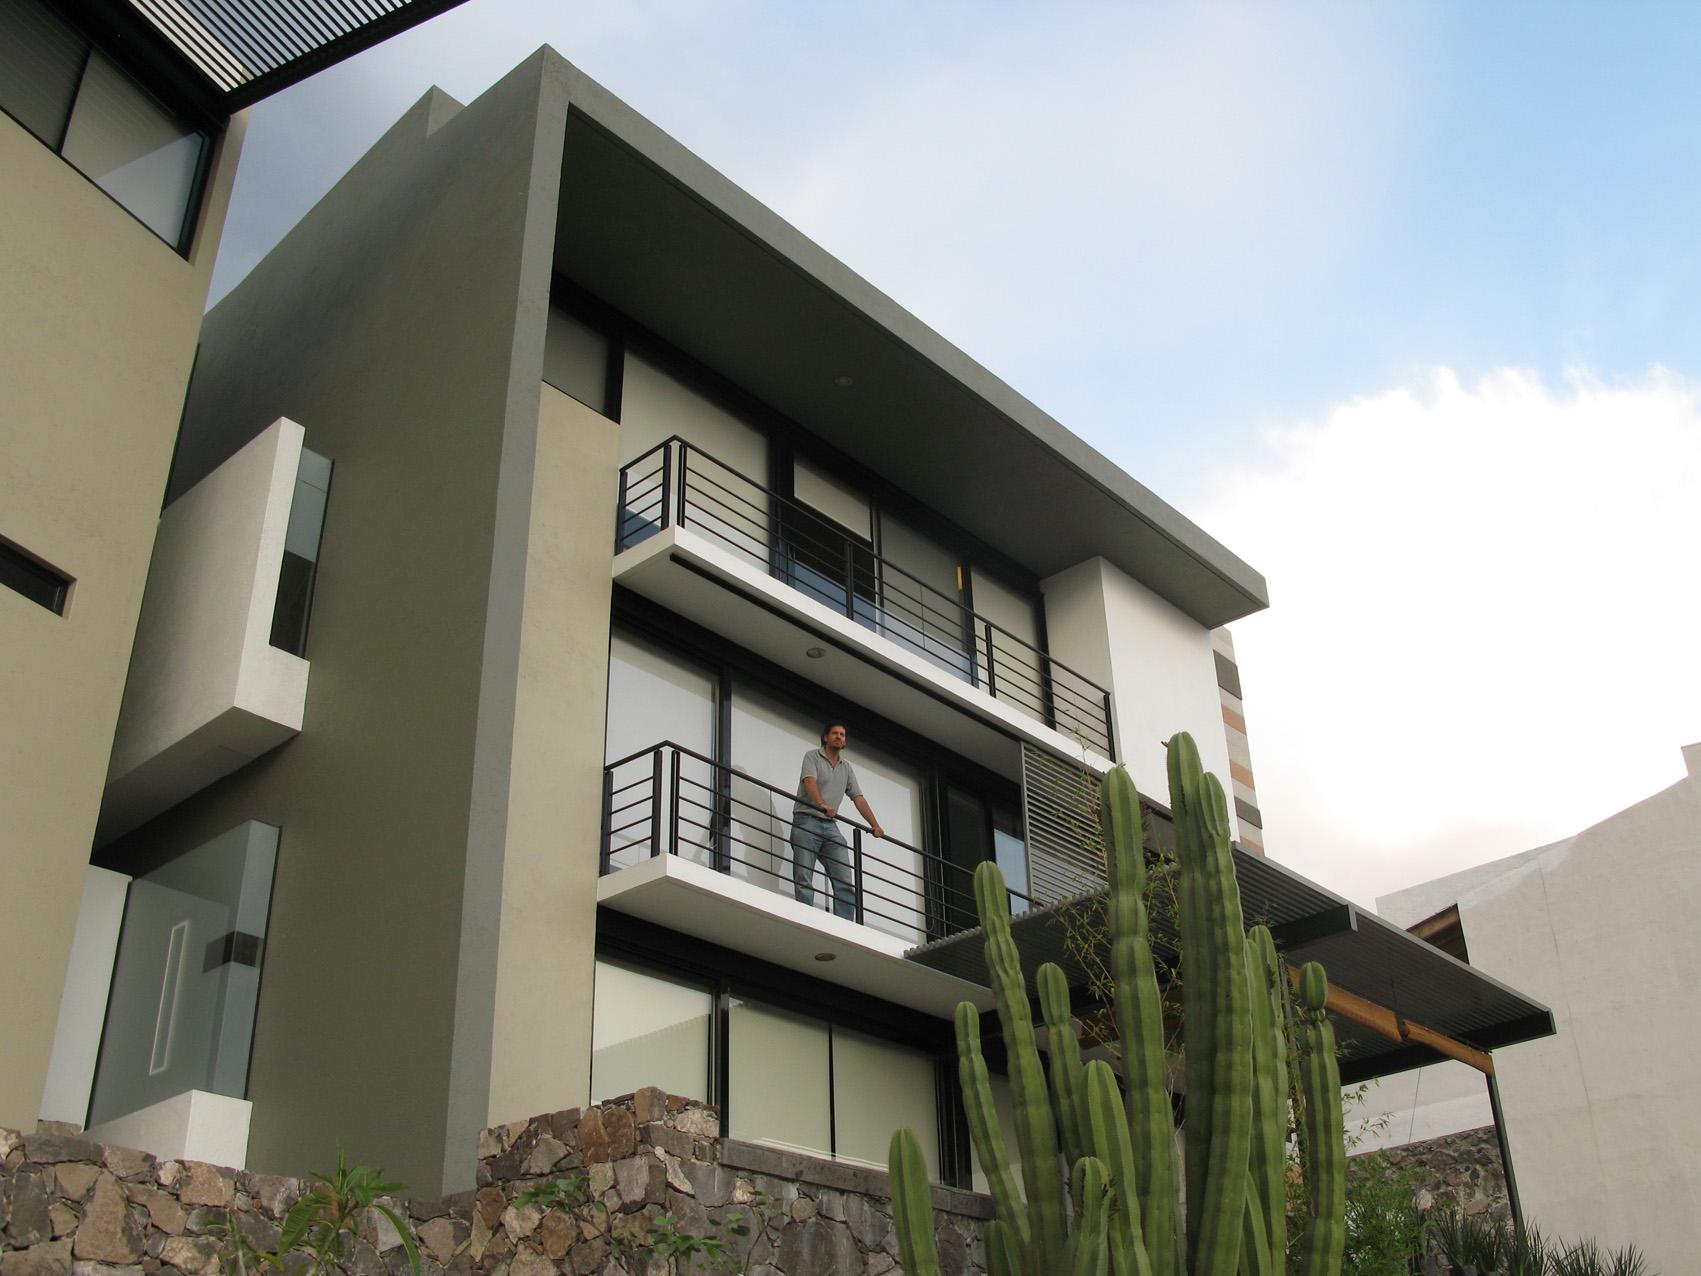 Revista de arquitectura y dise o peruarki casa privada - Arquitectura y diseno de casas ...